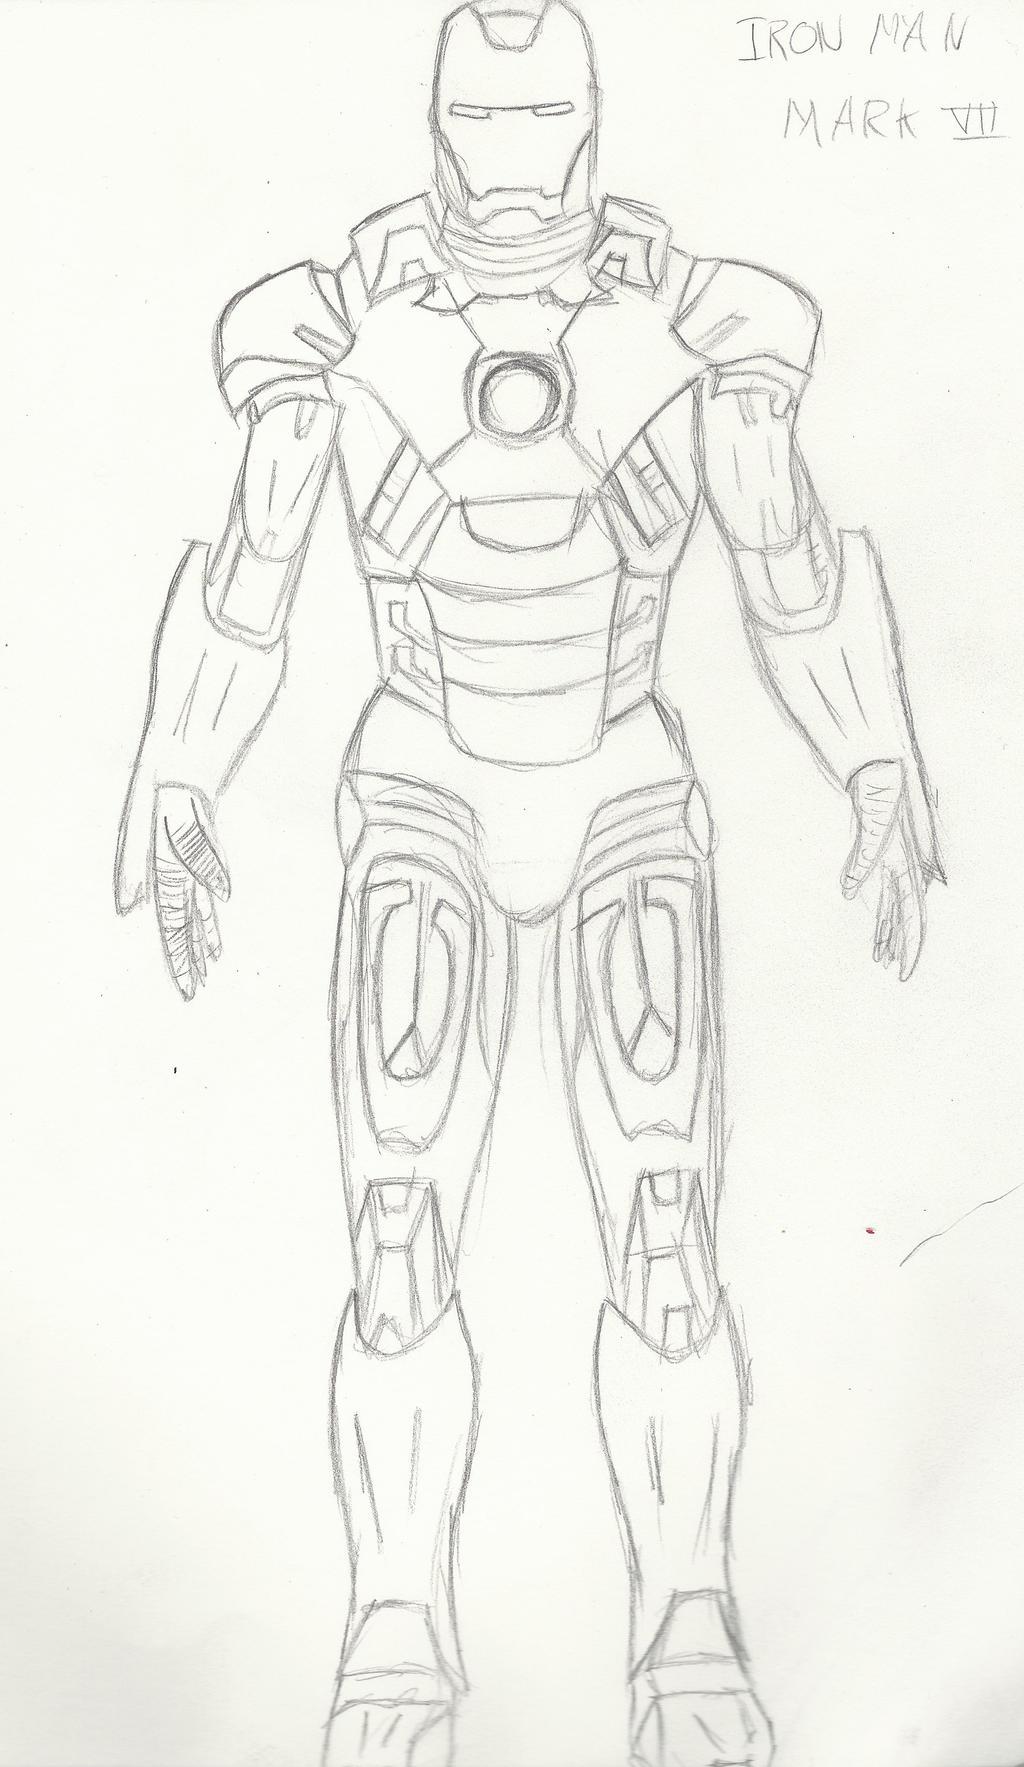 Iron Man Sketch 1 By Cordan-Wraith On DeviantArt